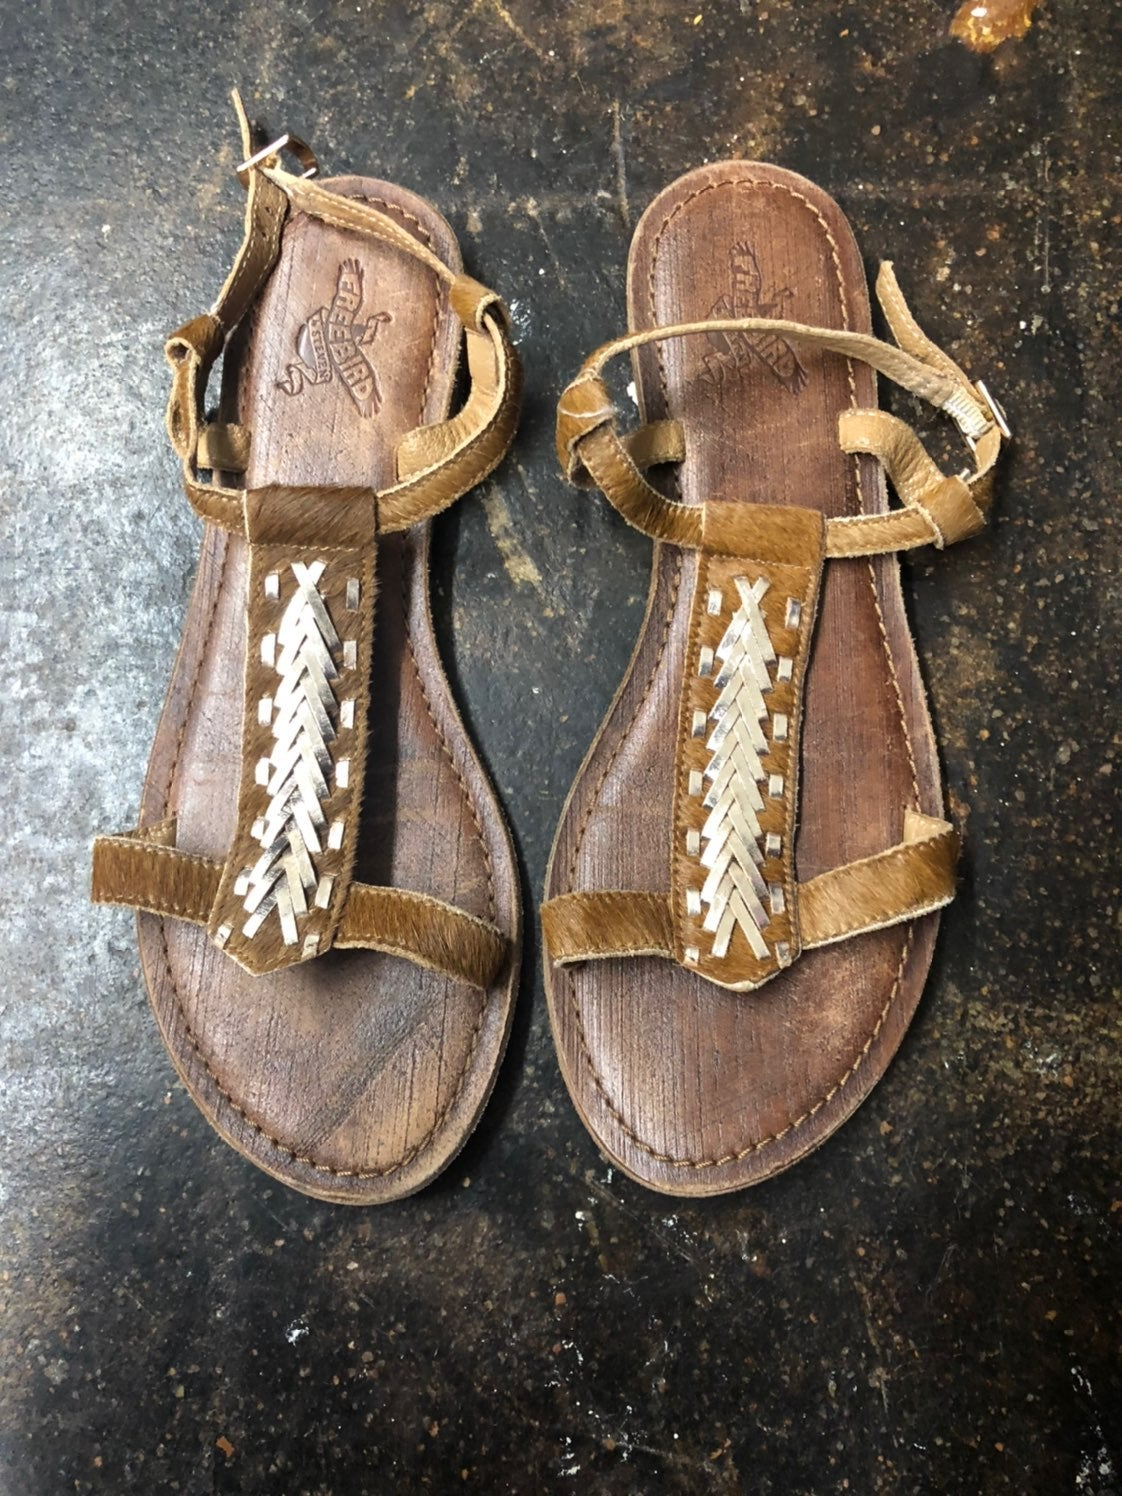 Freebird sandals